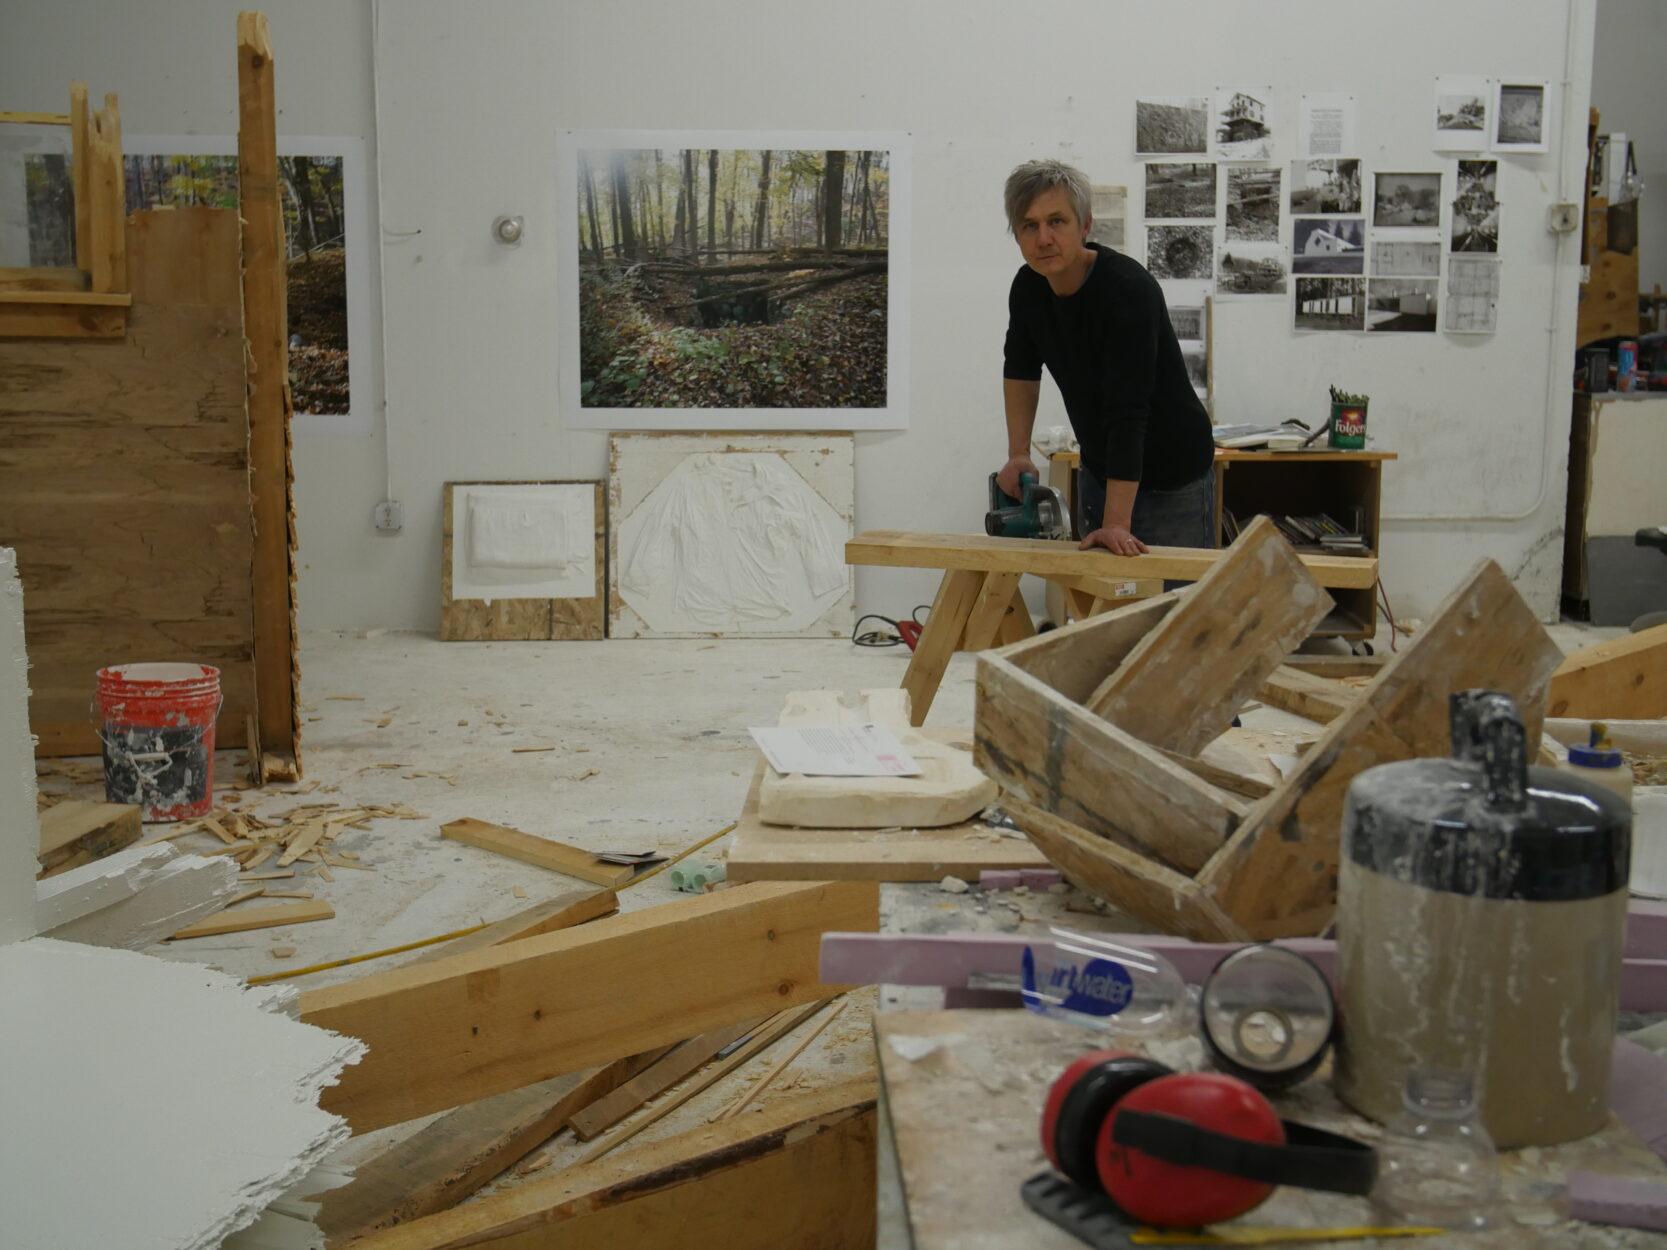 Chris Larson in his studio